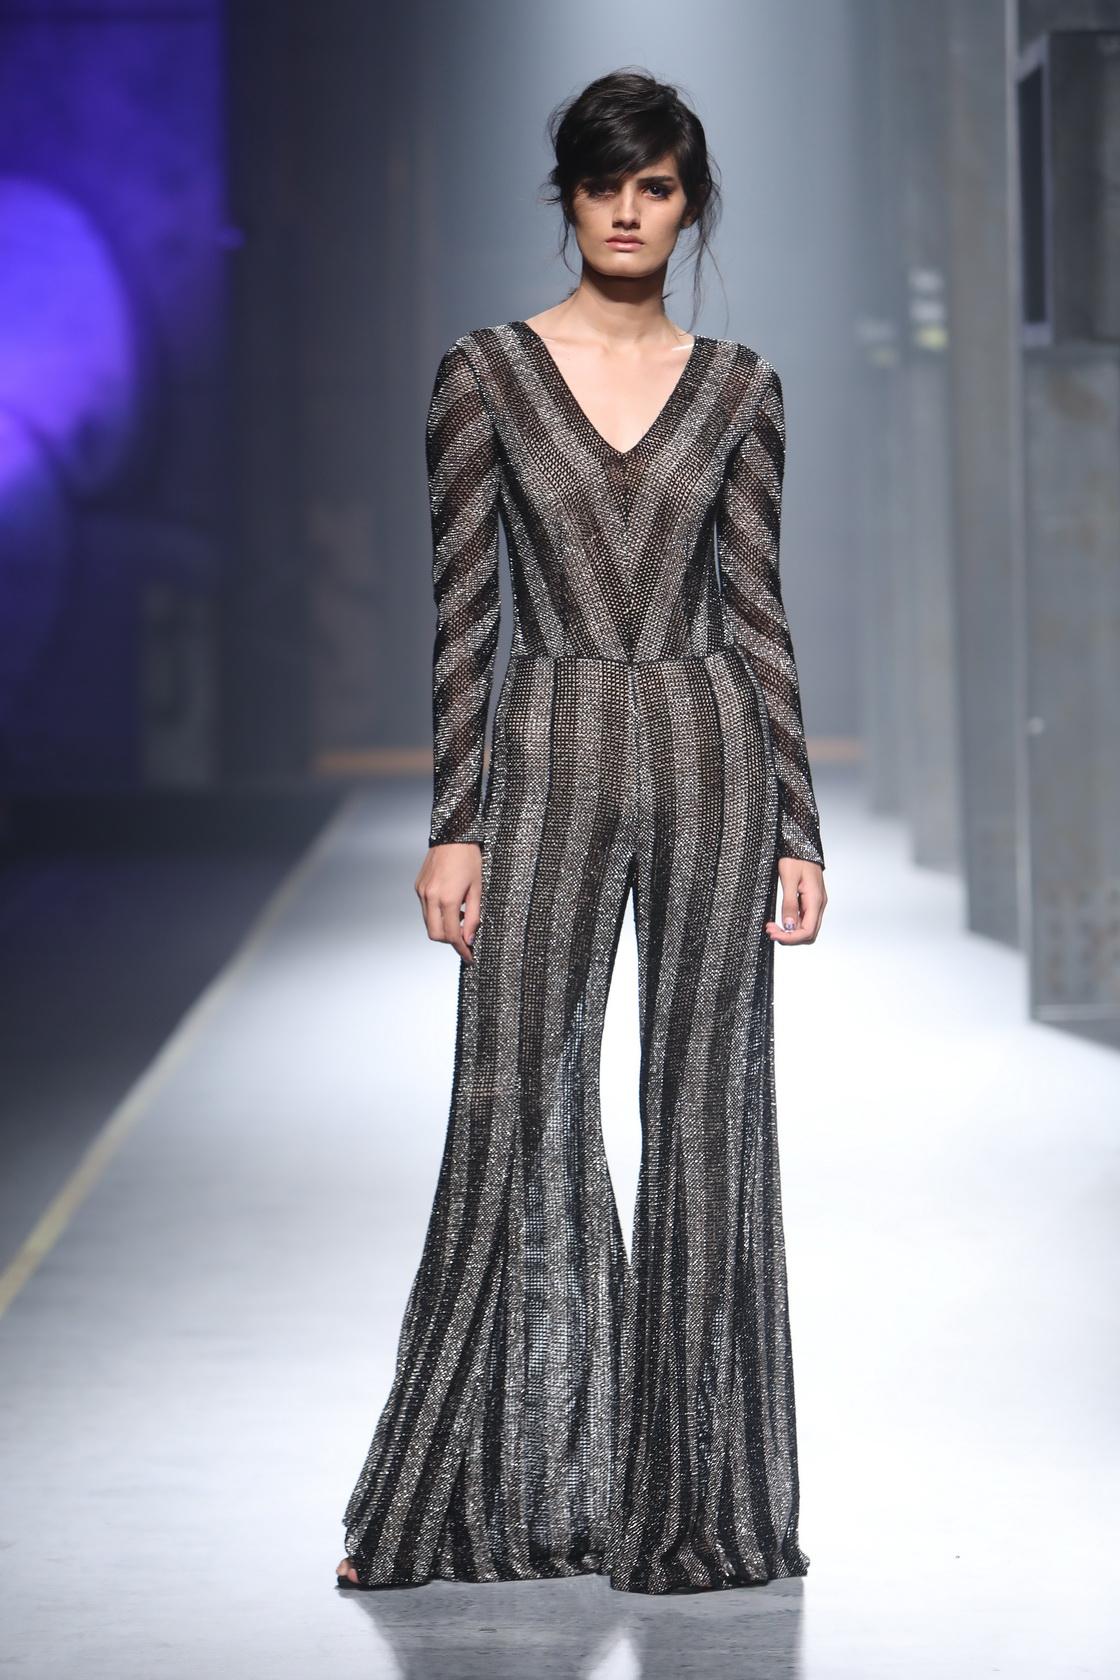 Namrata Joshipura Collections On Day 3 Of Amazon India Fashion Week 2017